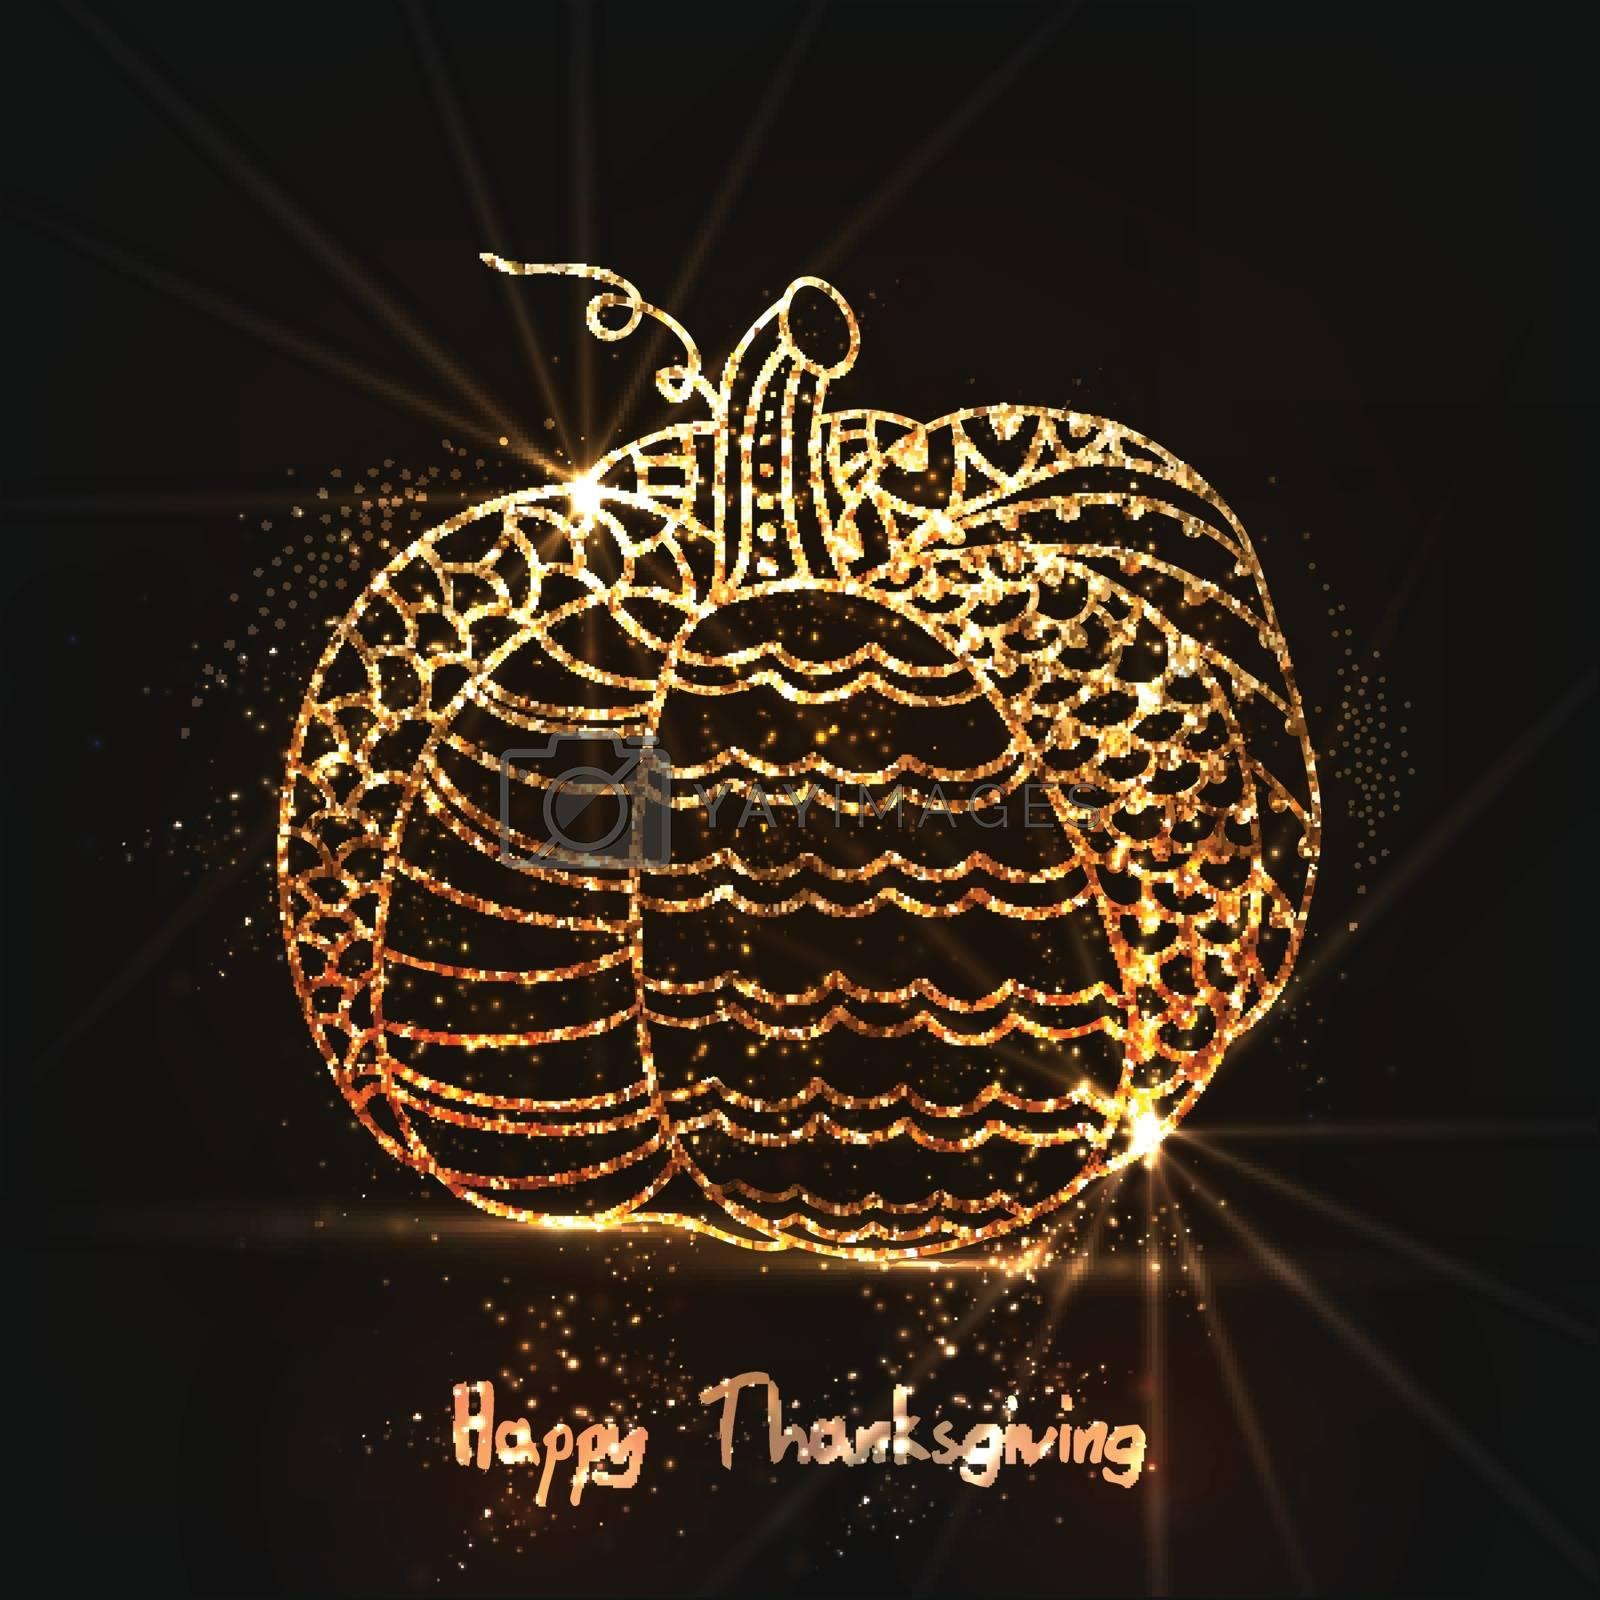 Golden pumpkin for Happy Thanksgiving Day celebration.